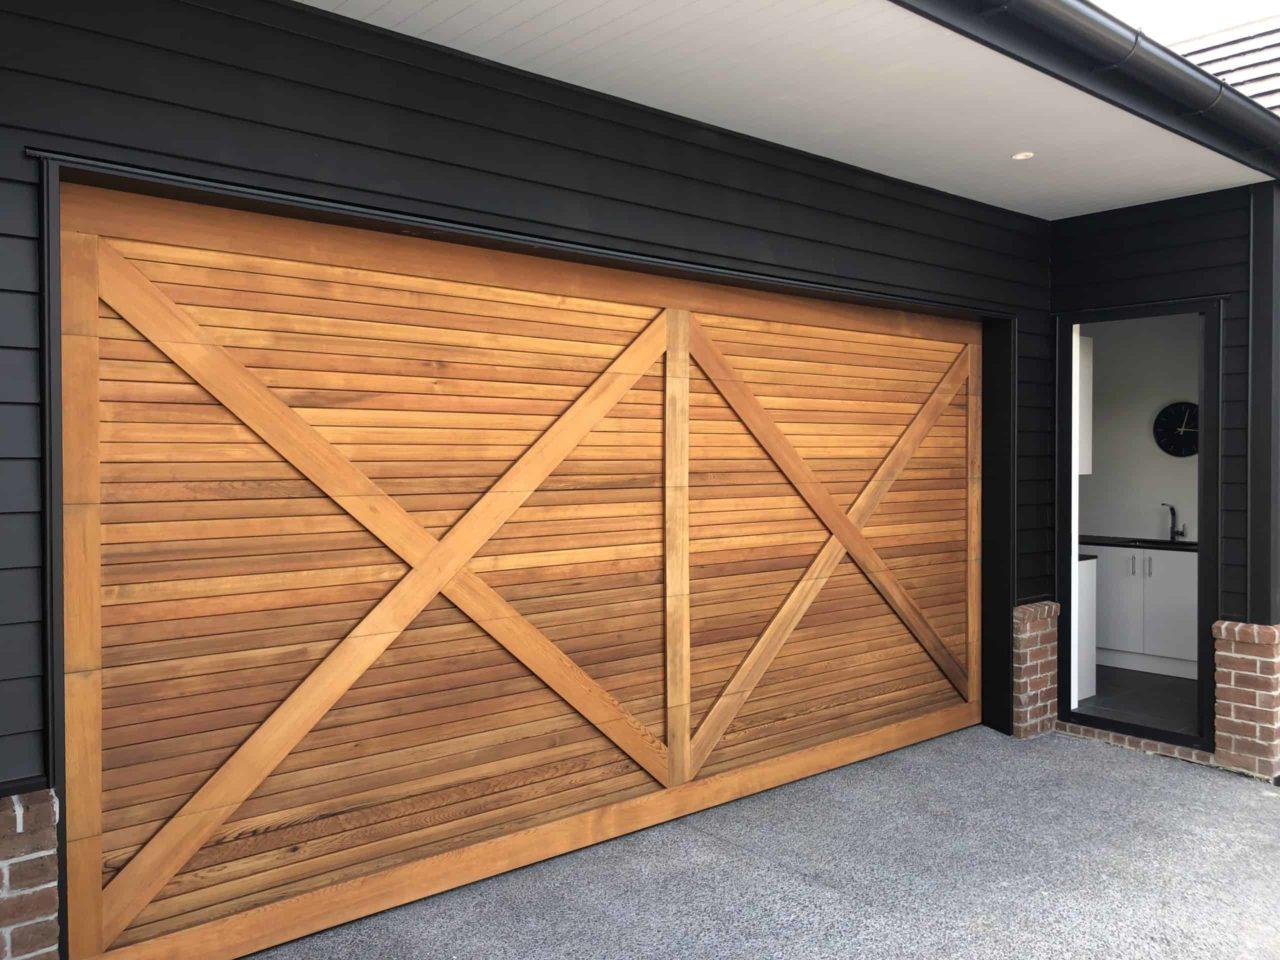 CP837 Horizontal Shiplap with double driss cross batten overlay Cedar Custom Made Sectional Garage Door